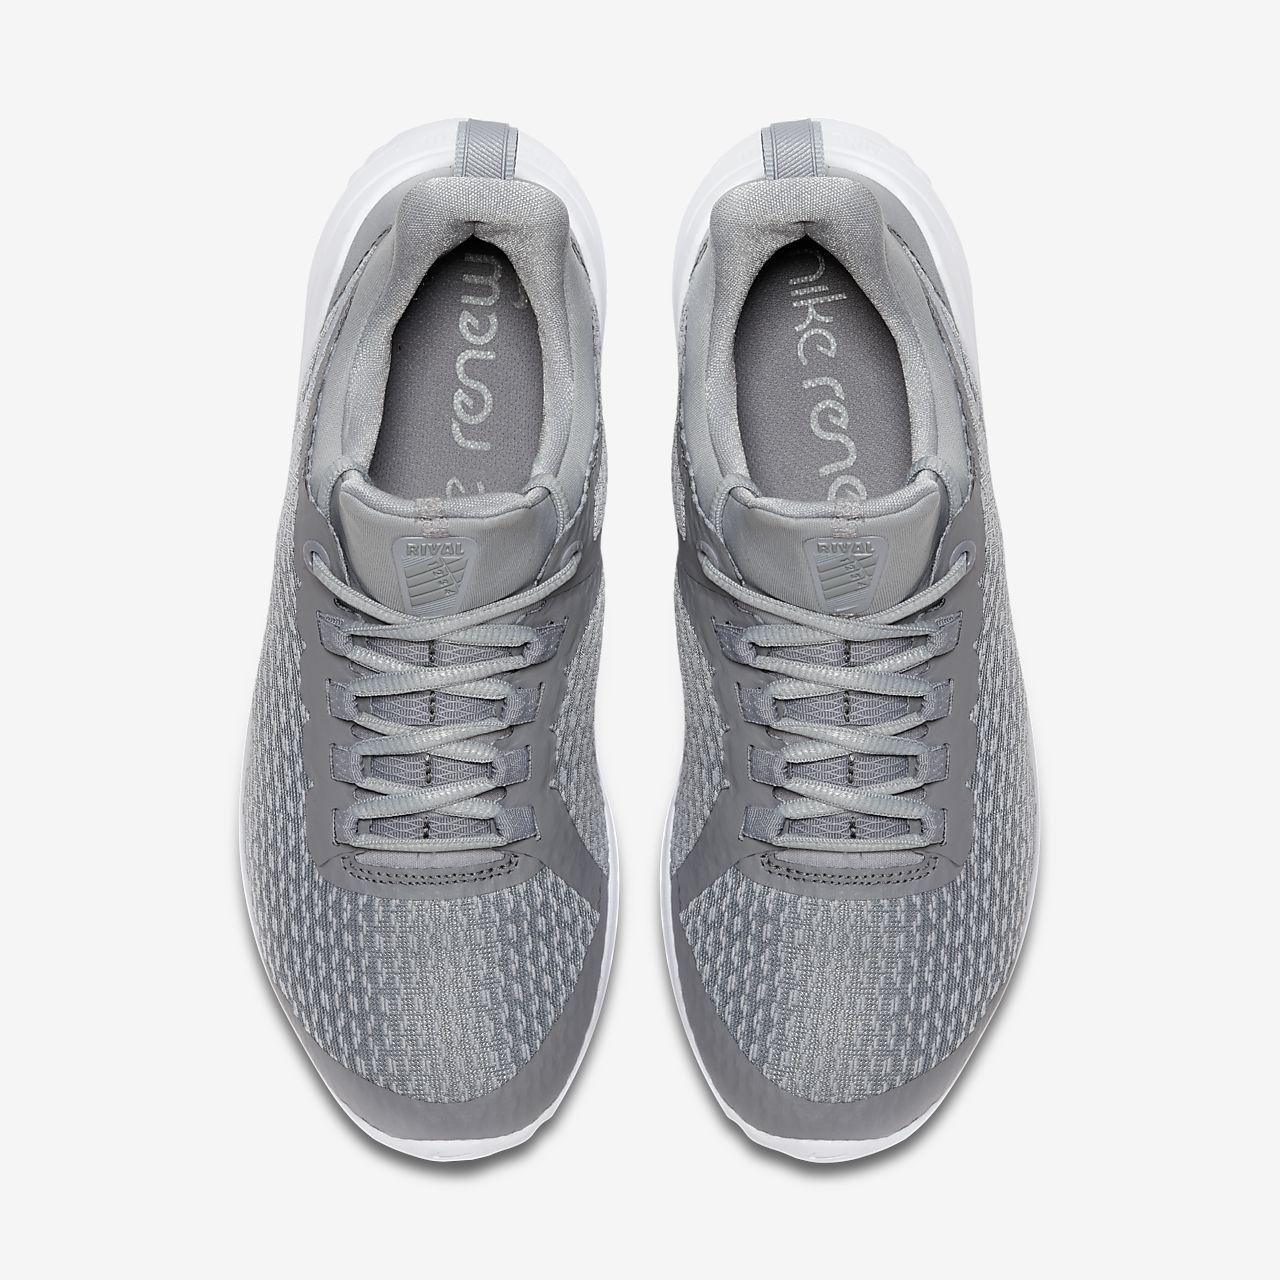 reputable site 2c44c ed73b ... Nike Renew Rival Women s Running Shoe